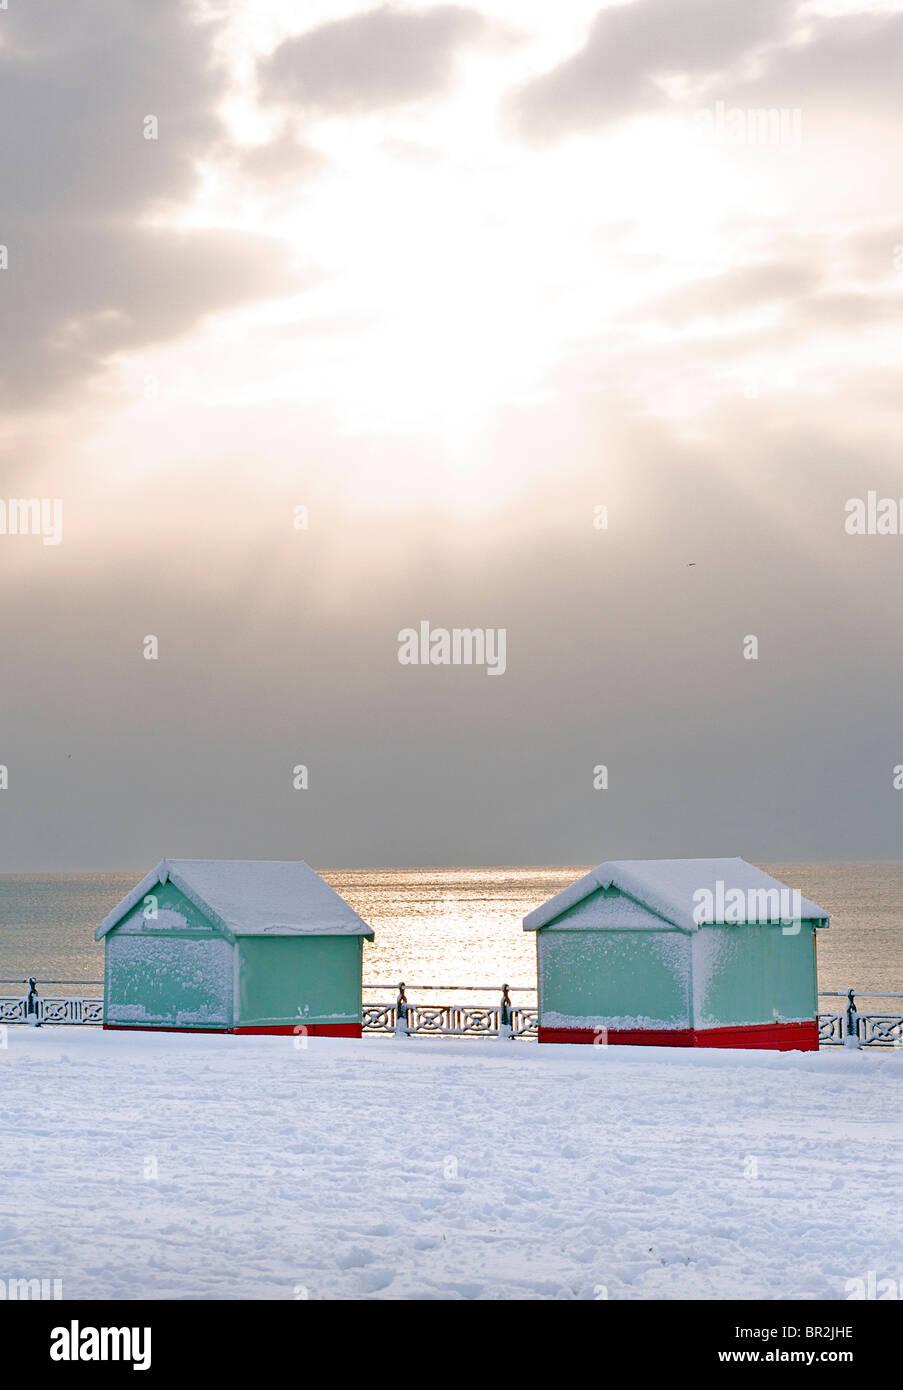 Beach huts on Hove promenade in snow. Winter. Brighton & Hove, East Sussex, England Stock Photo